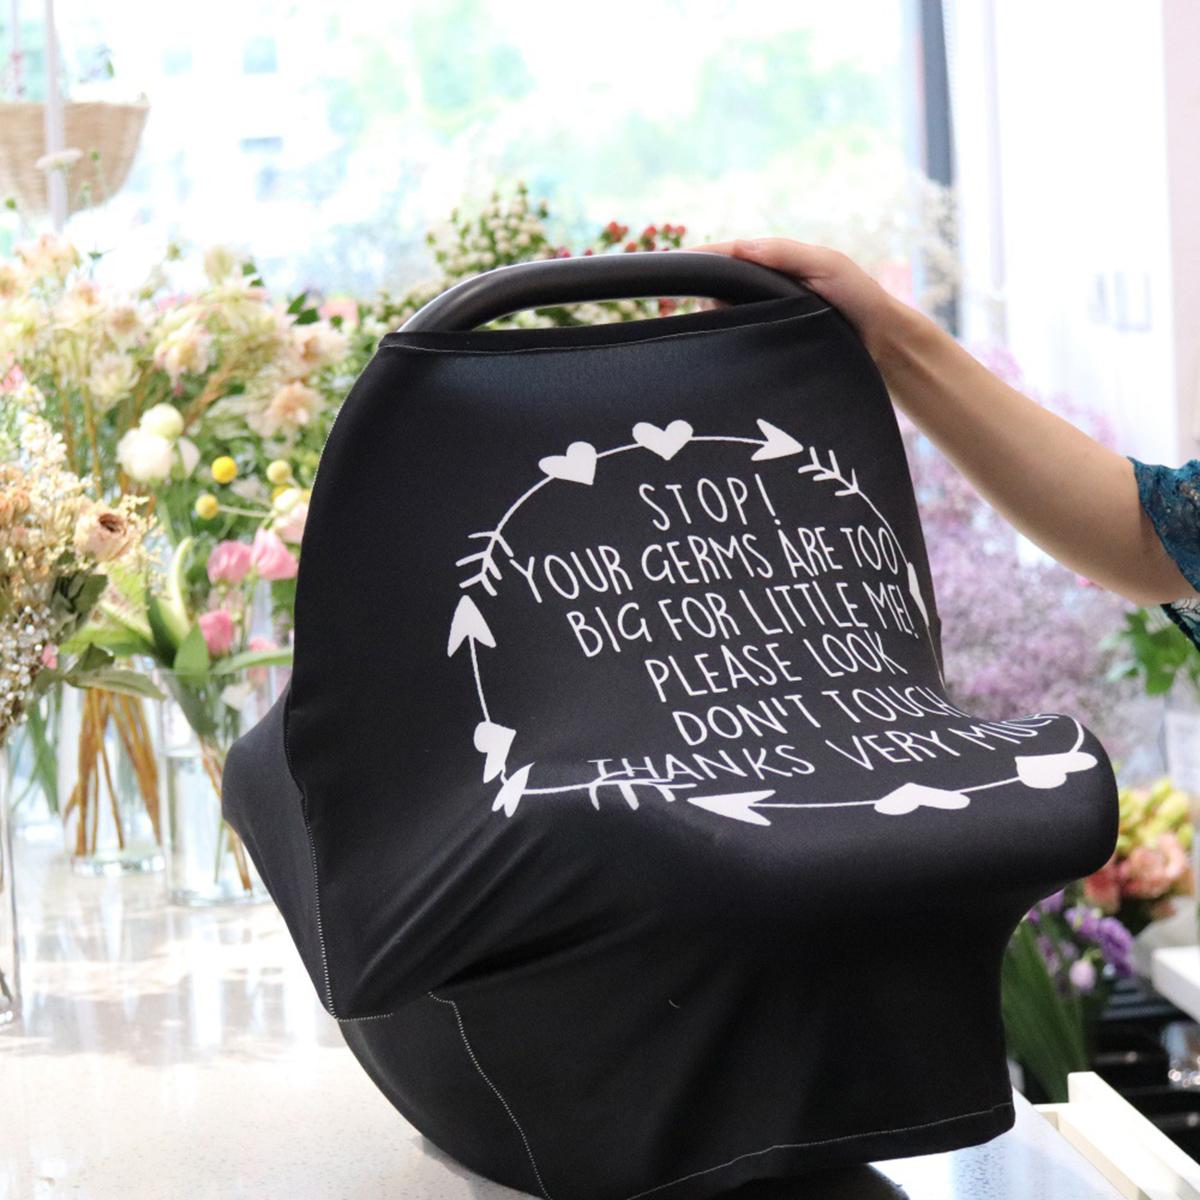 Nursing Cover For Newborn Breastfeeding Car Seat Baby Infant Stroller Canopy